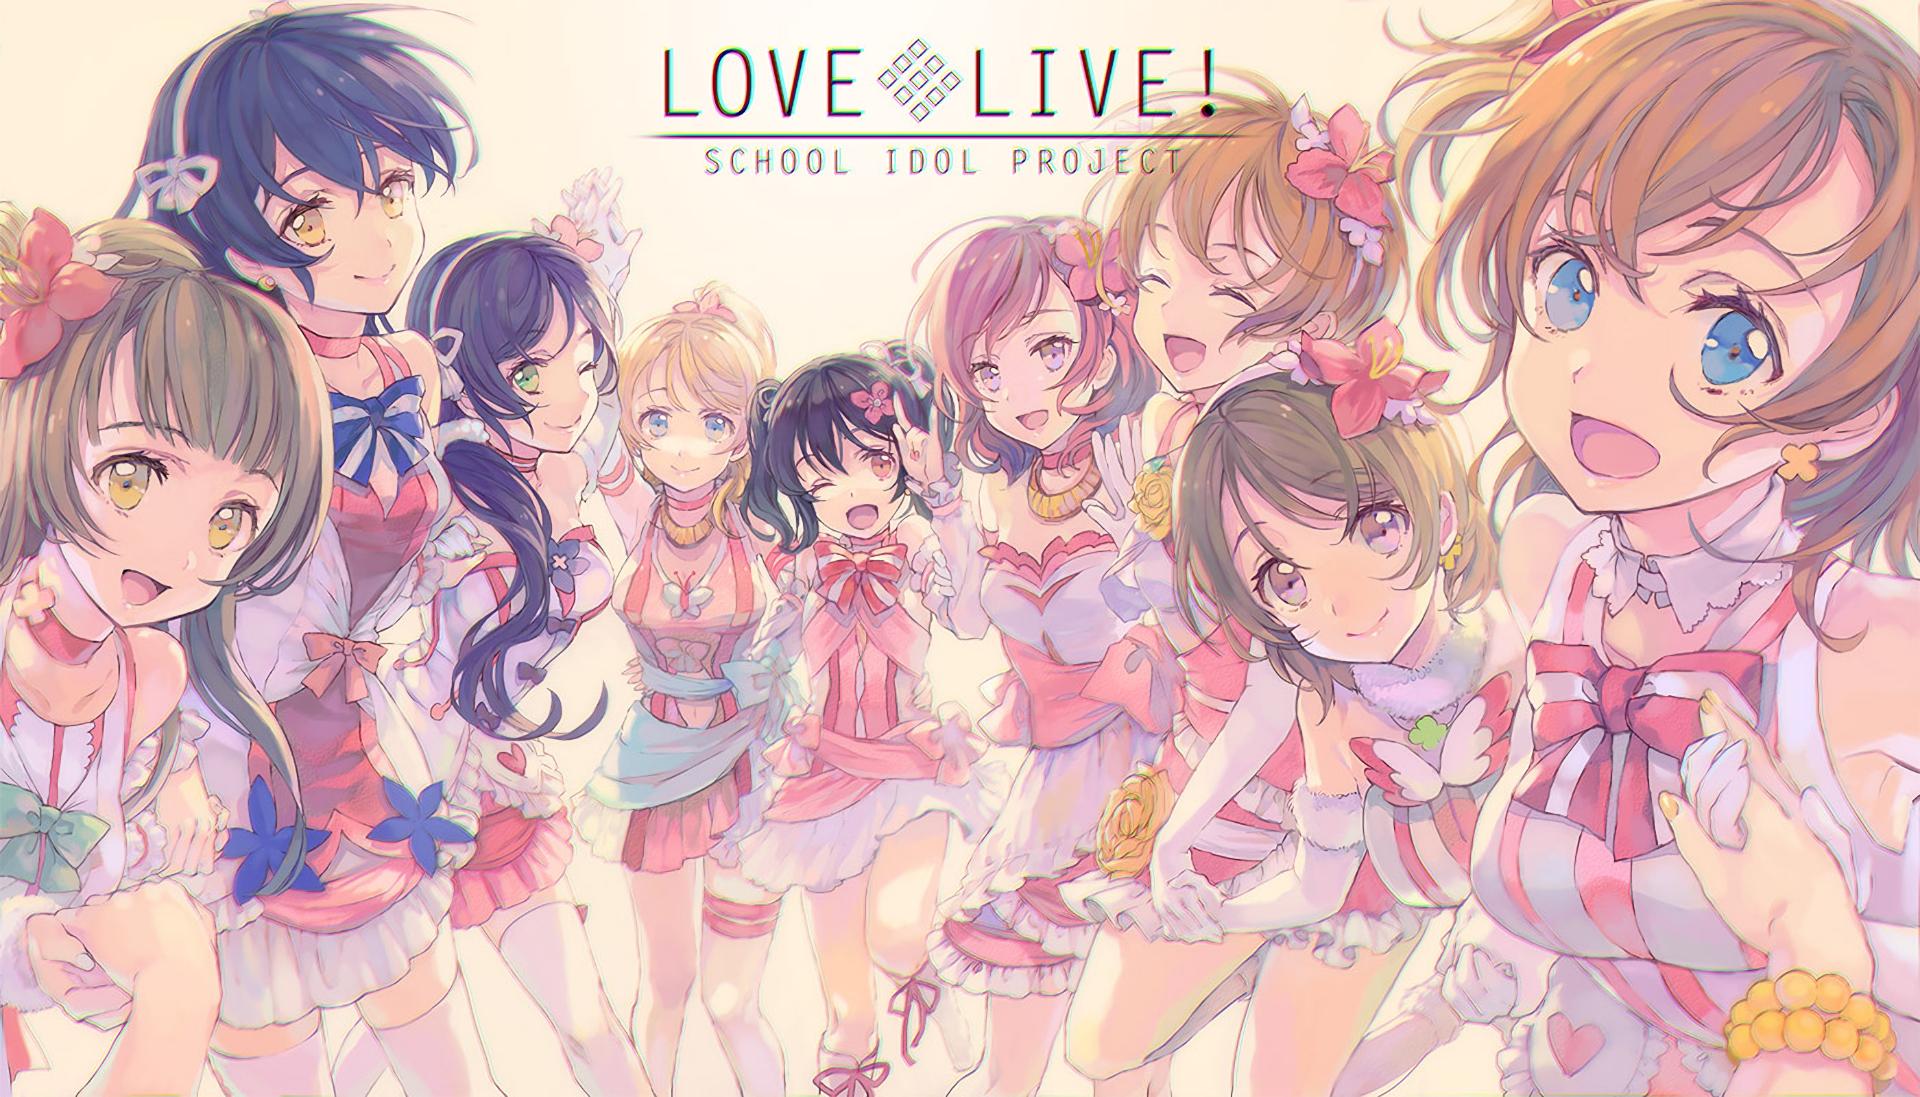 Love Live Hd Wallpaper Hintergrund 1920x1097 Id707187